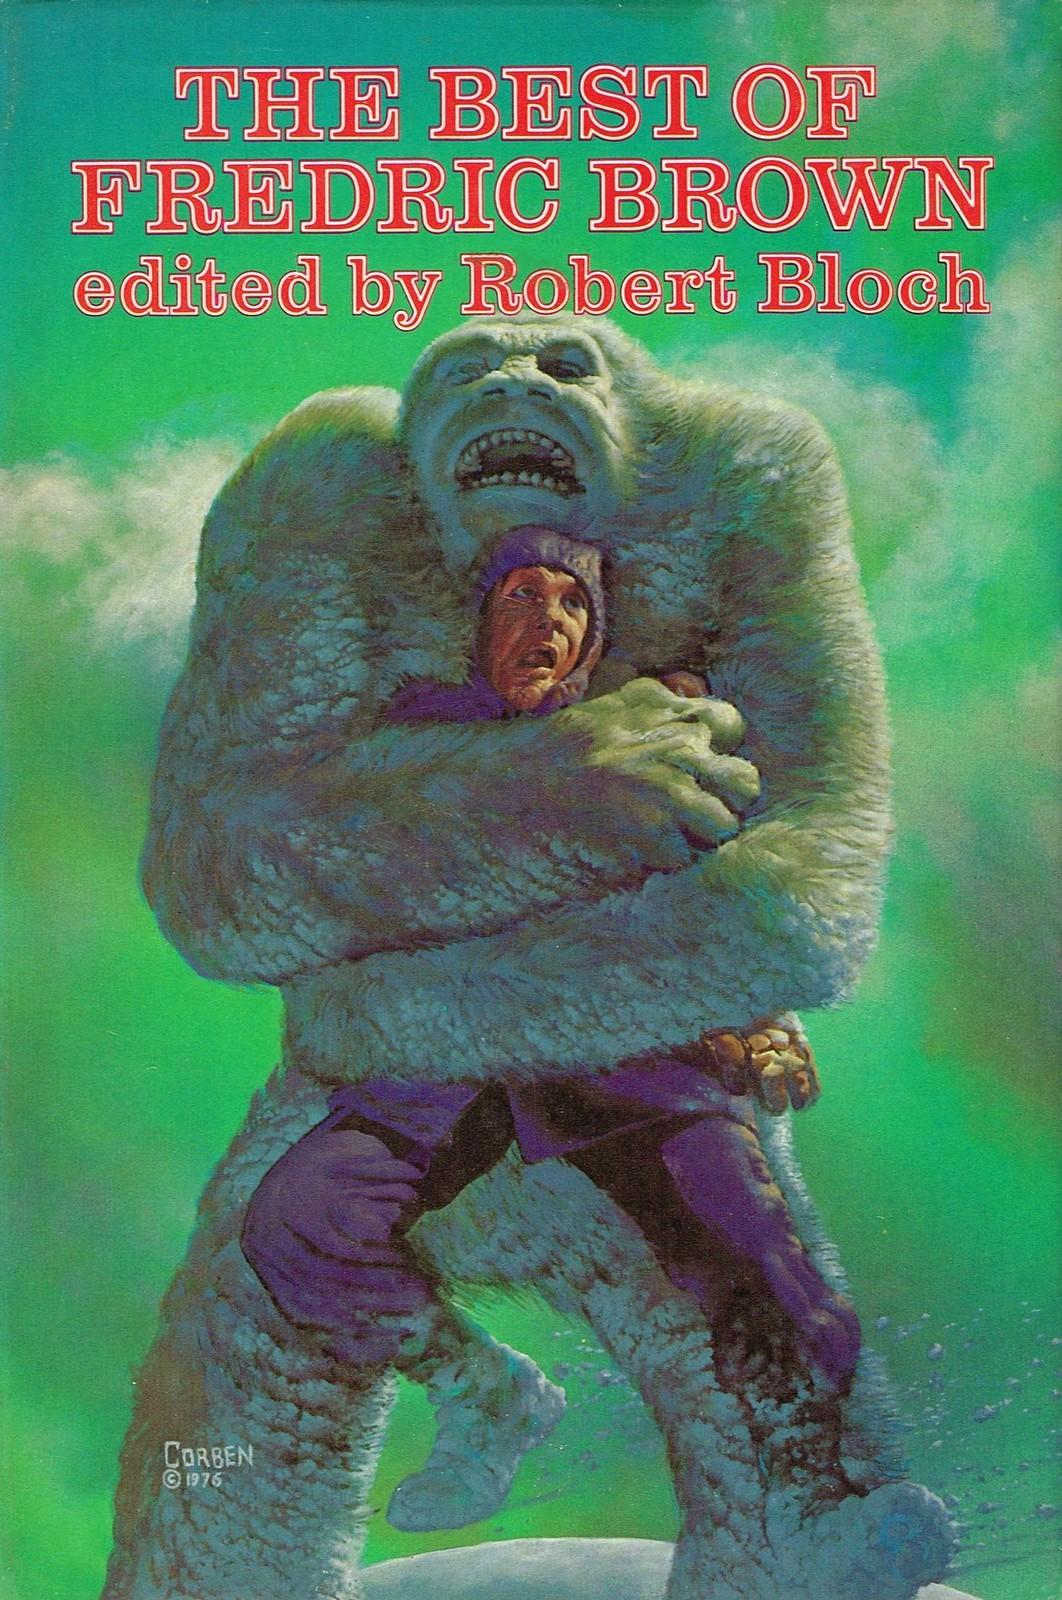 Richard Corben - The Best of Fredric Brown edited by Robert Bloch, 1976